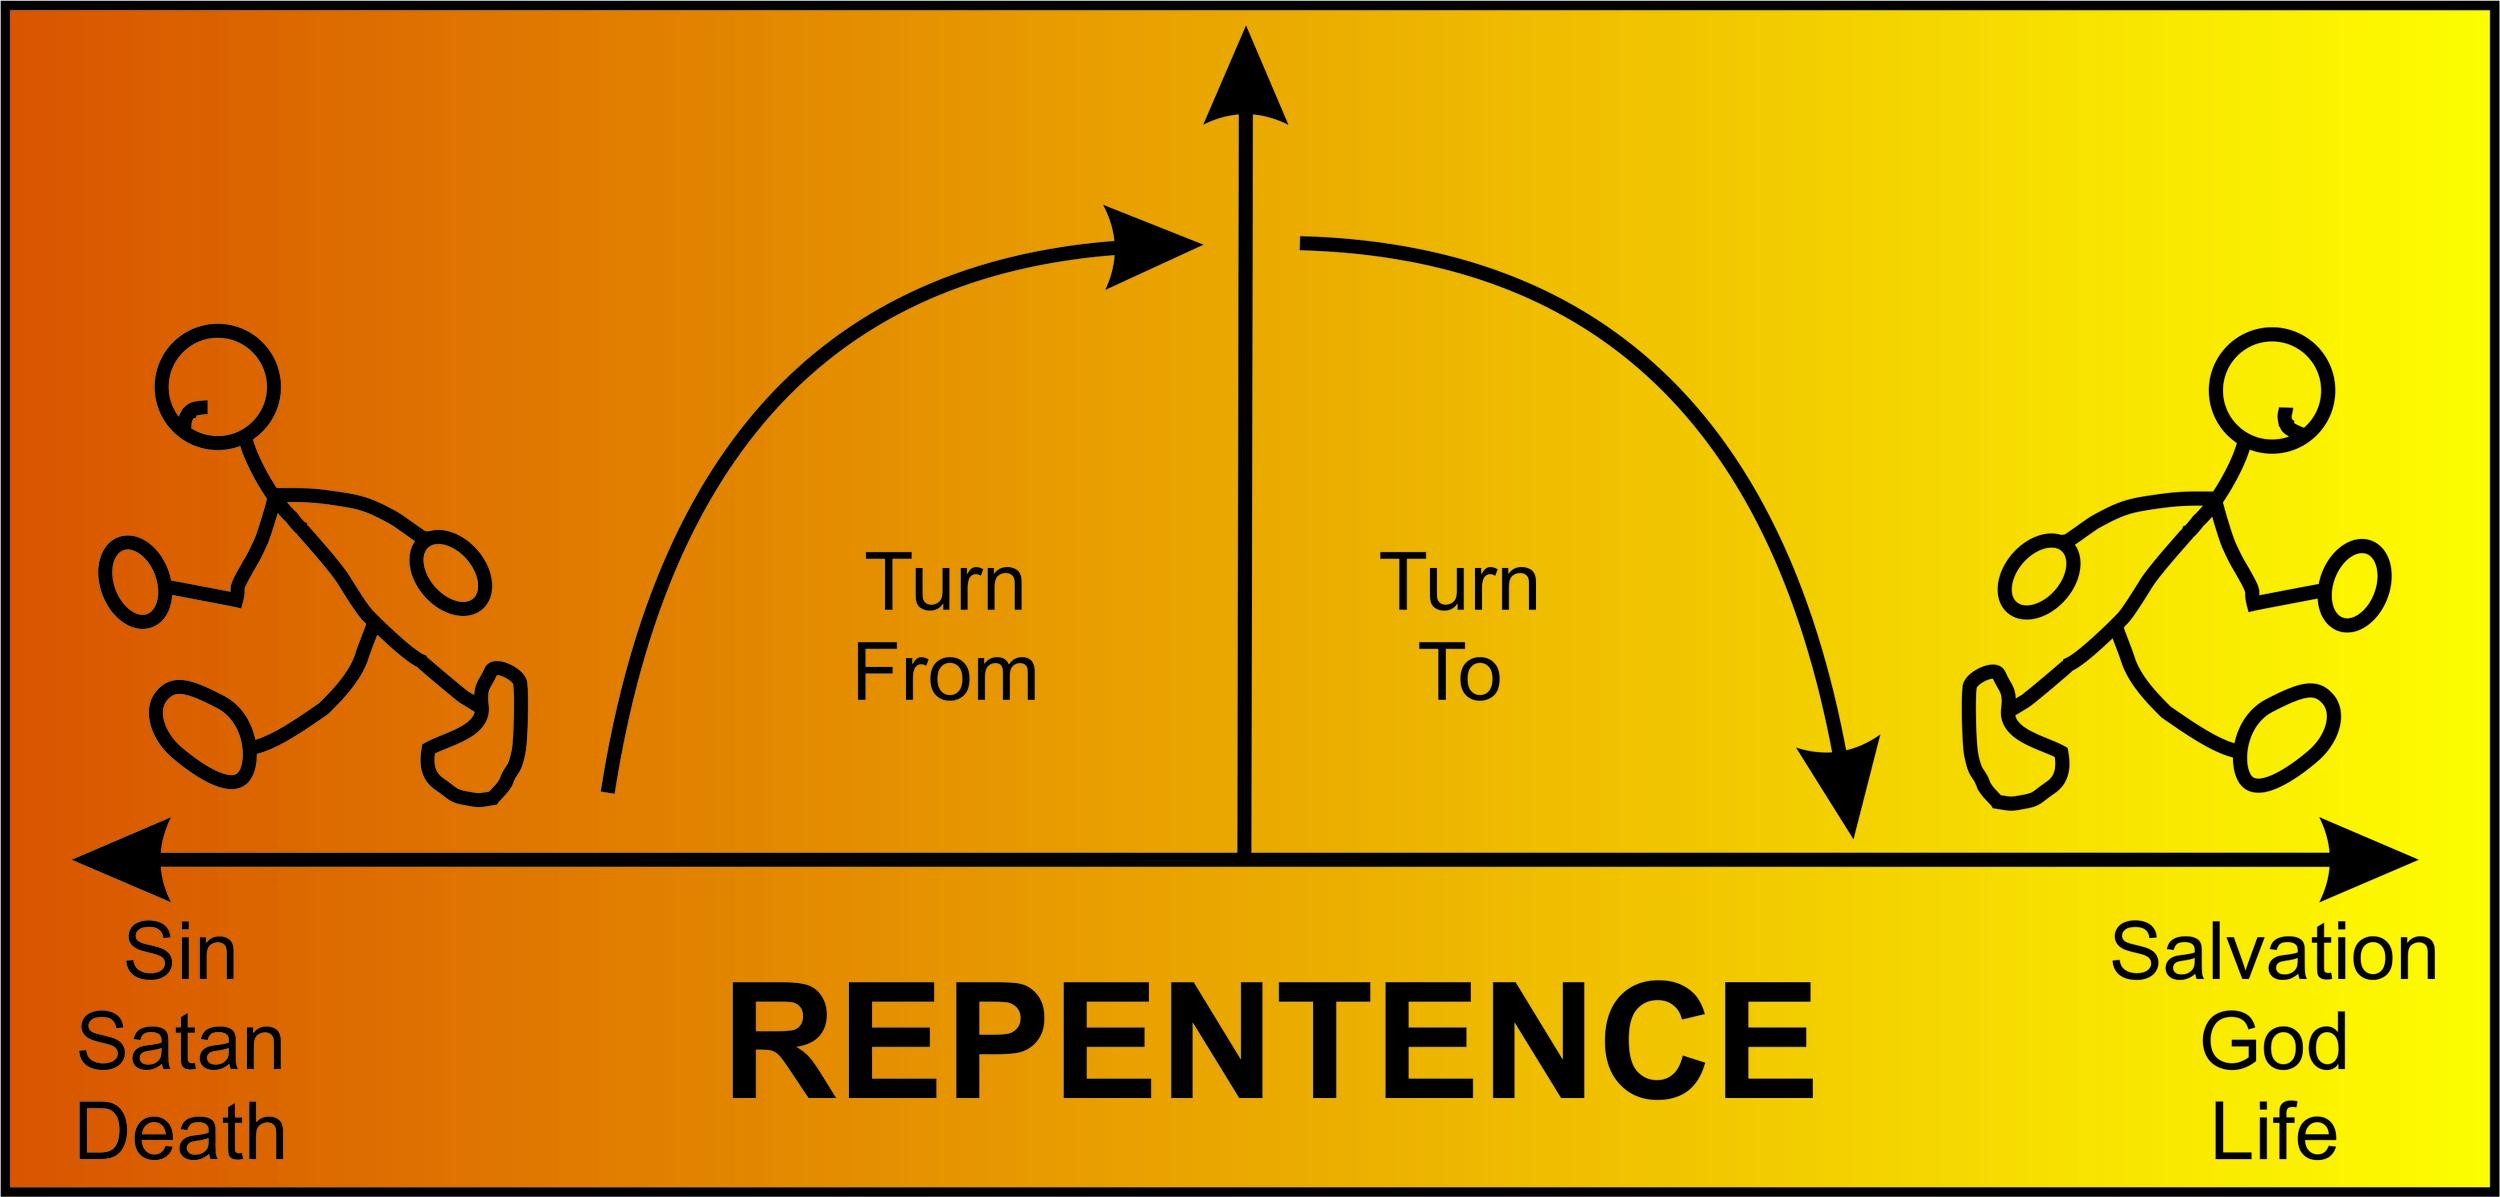 02 repentance.jpg